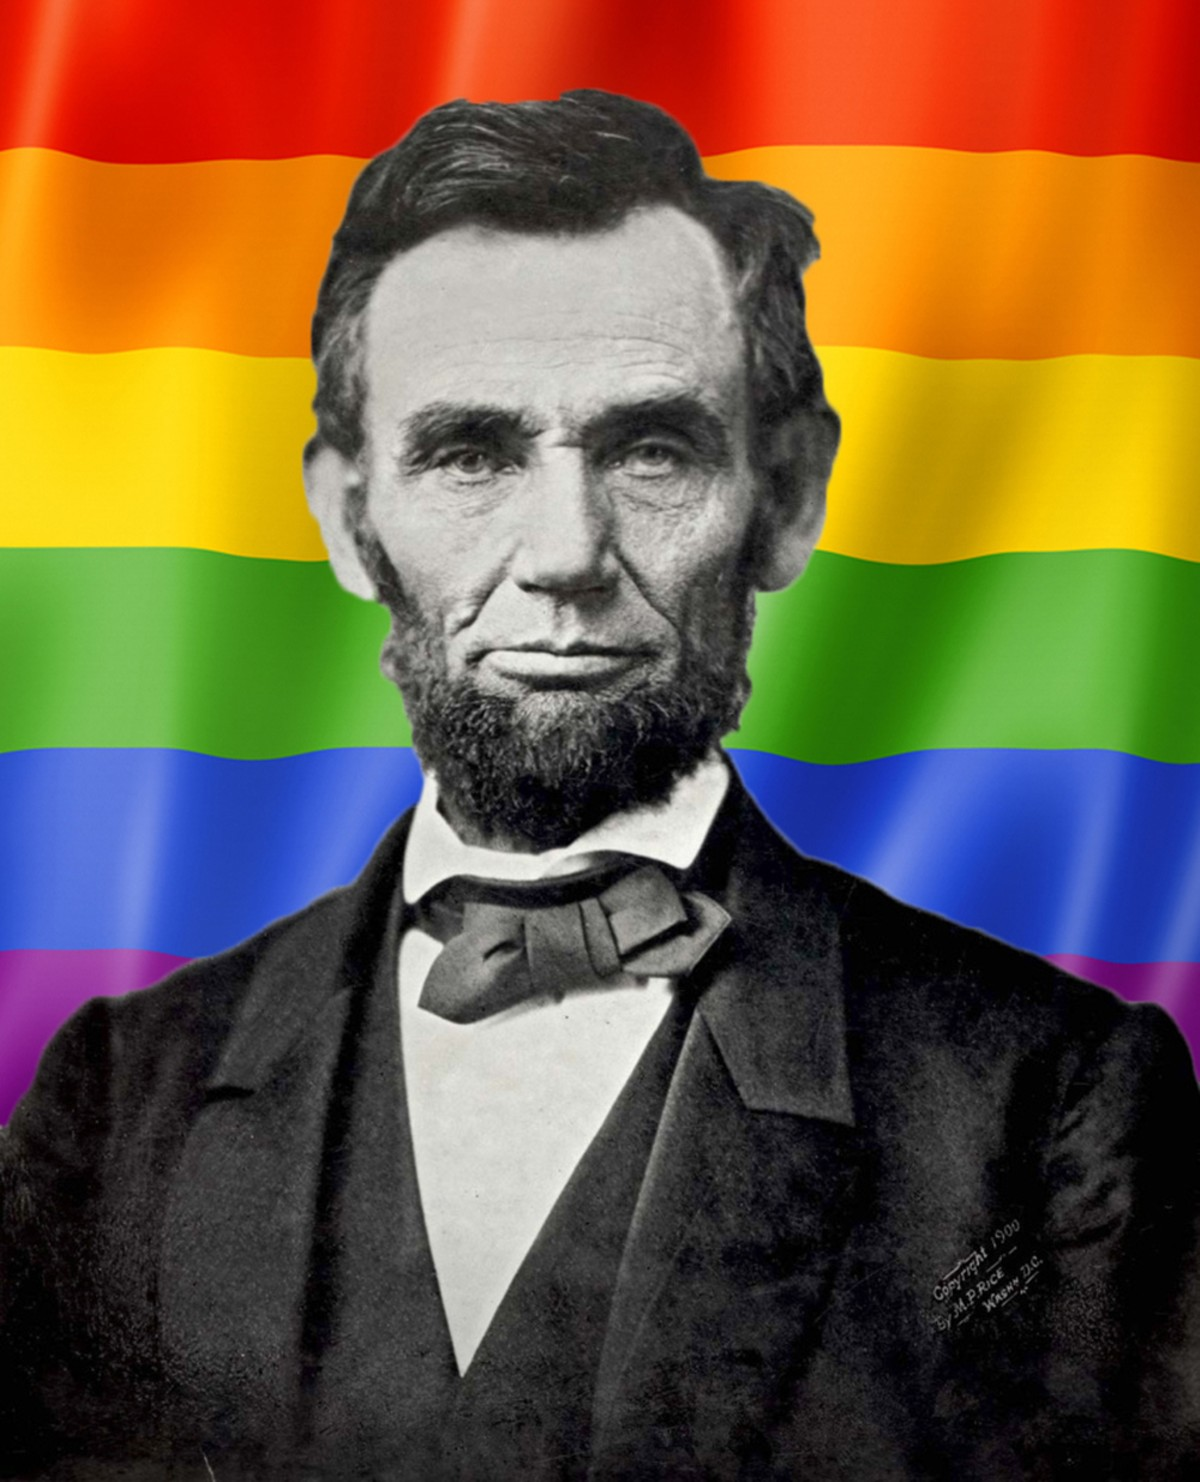 1000w_gaybelincoln.jpg